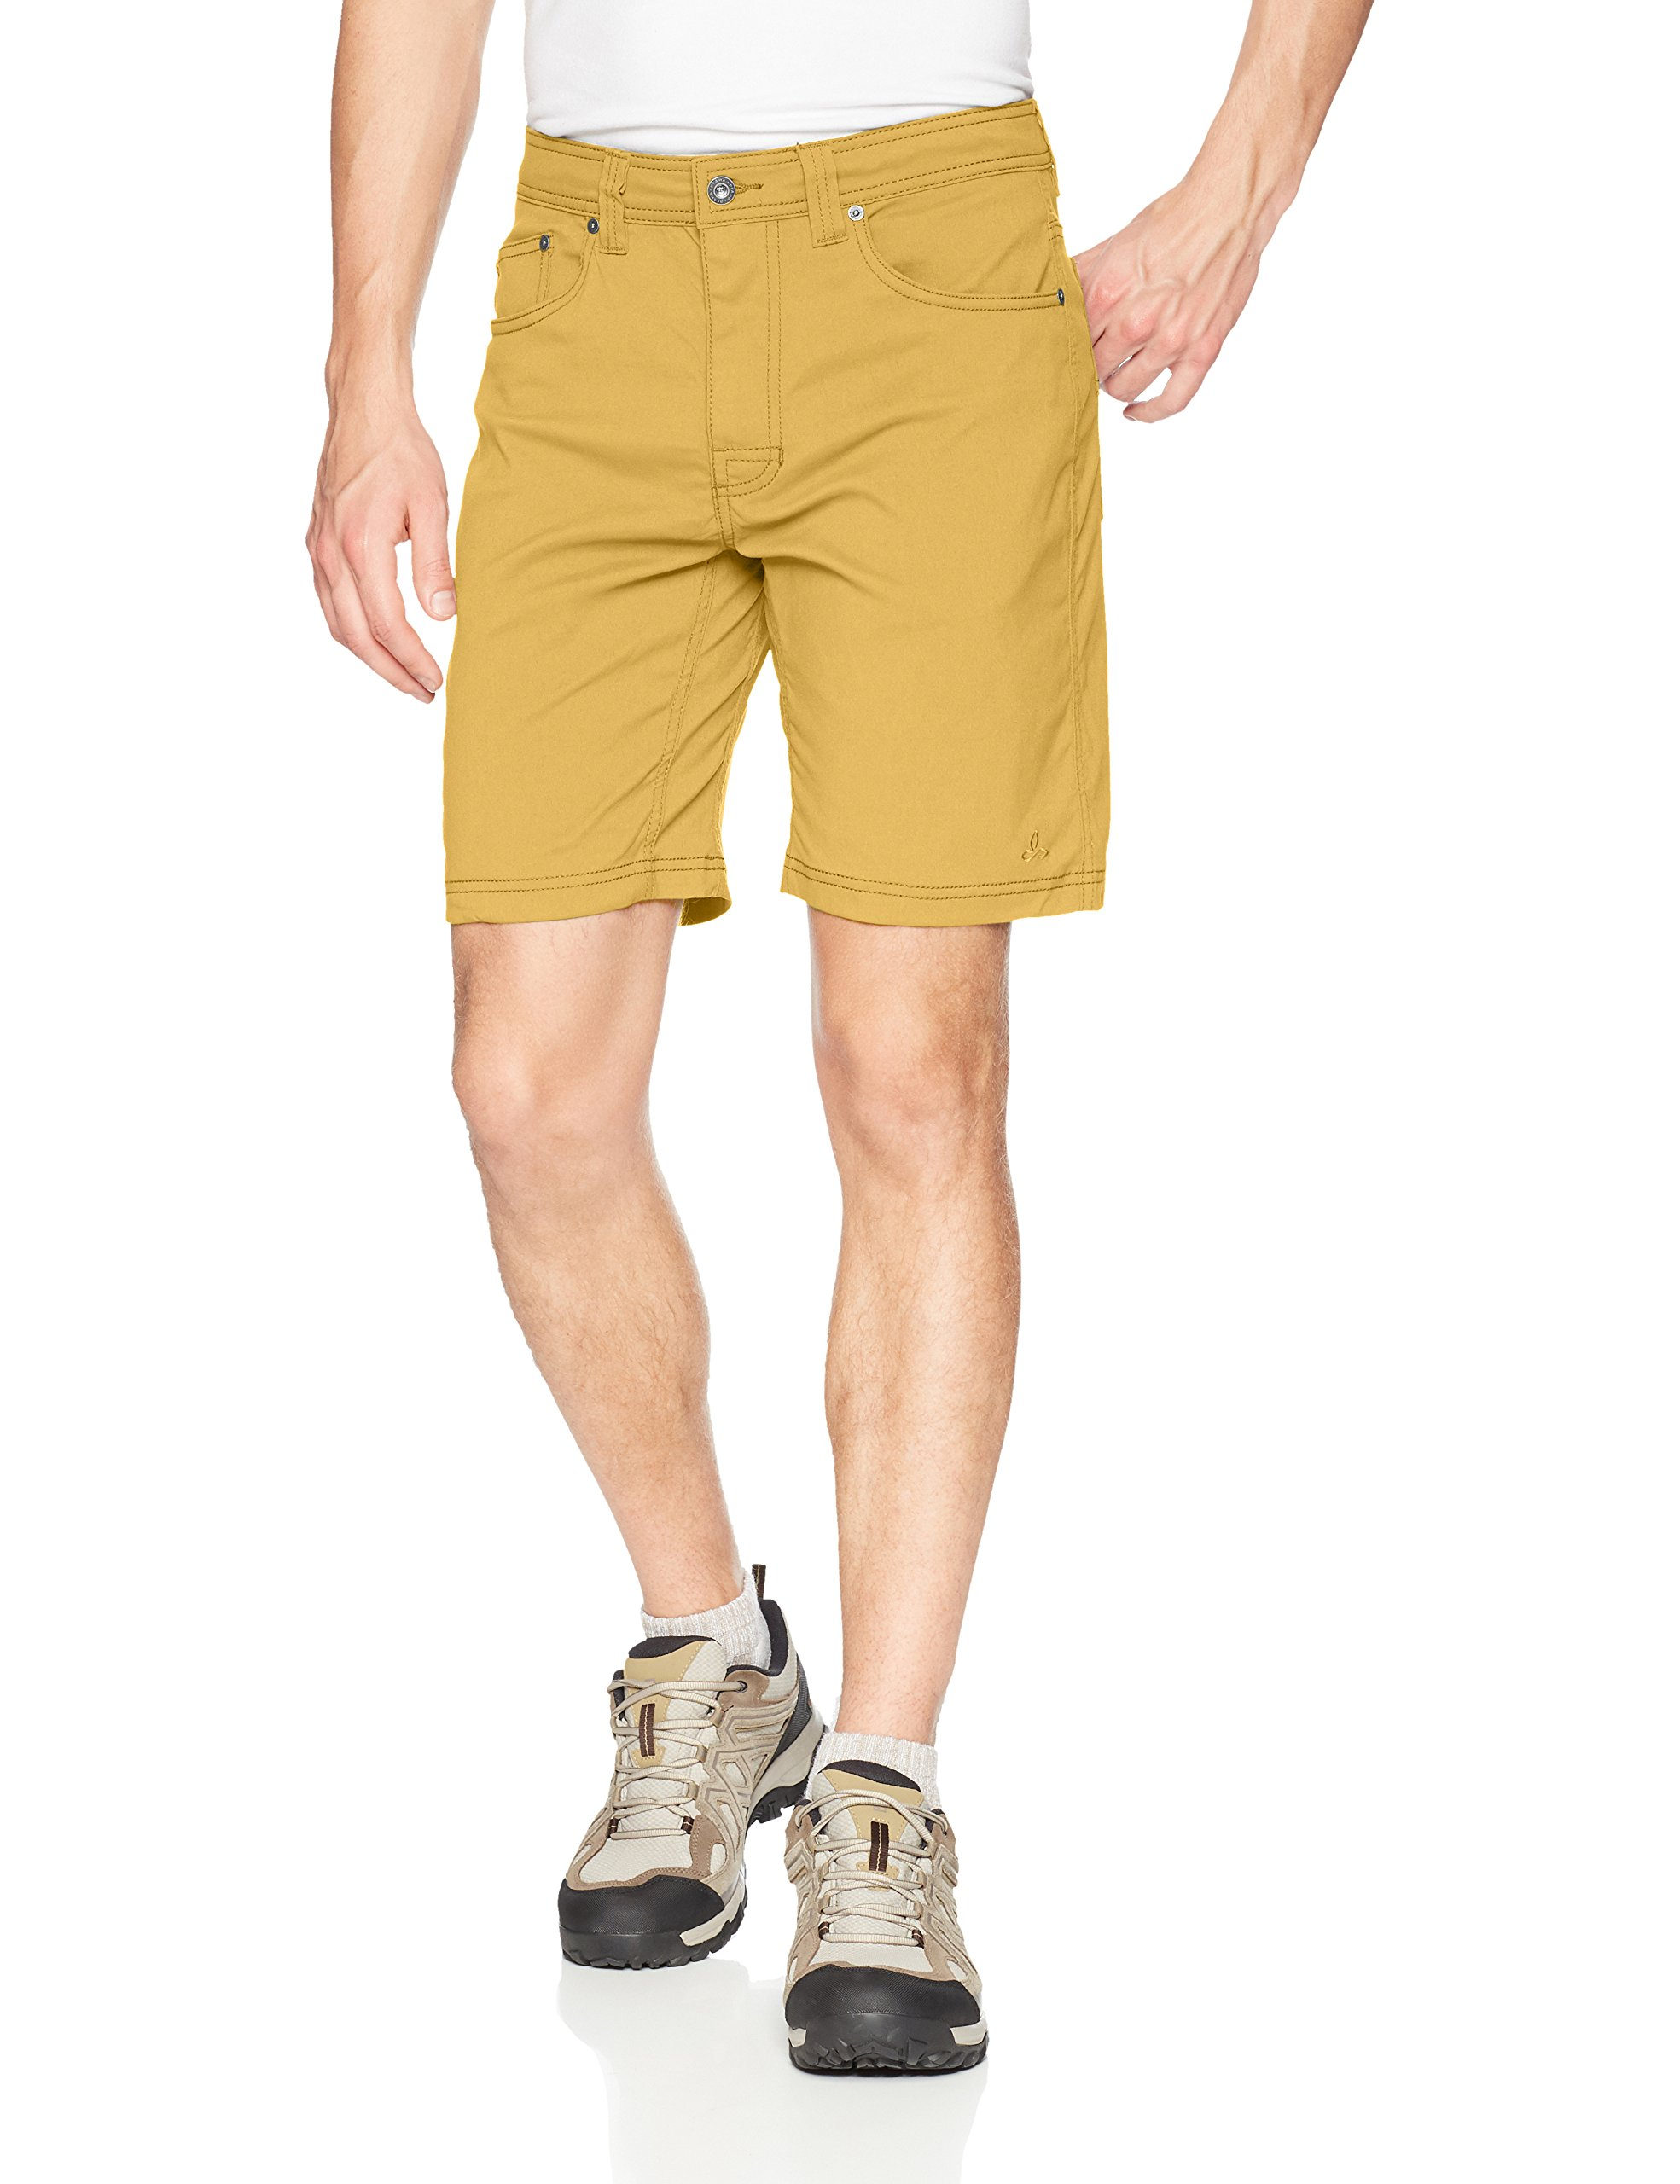 prAna Men's Brion Shorts, Sandpiper, 28W 9L